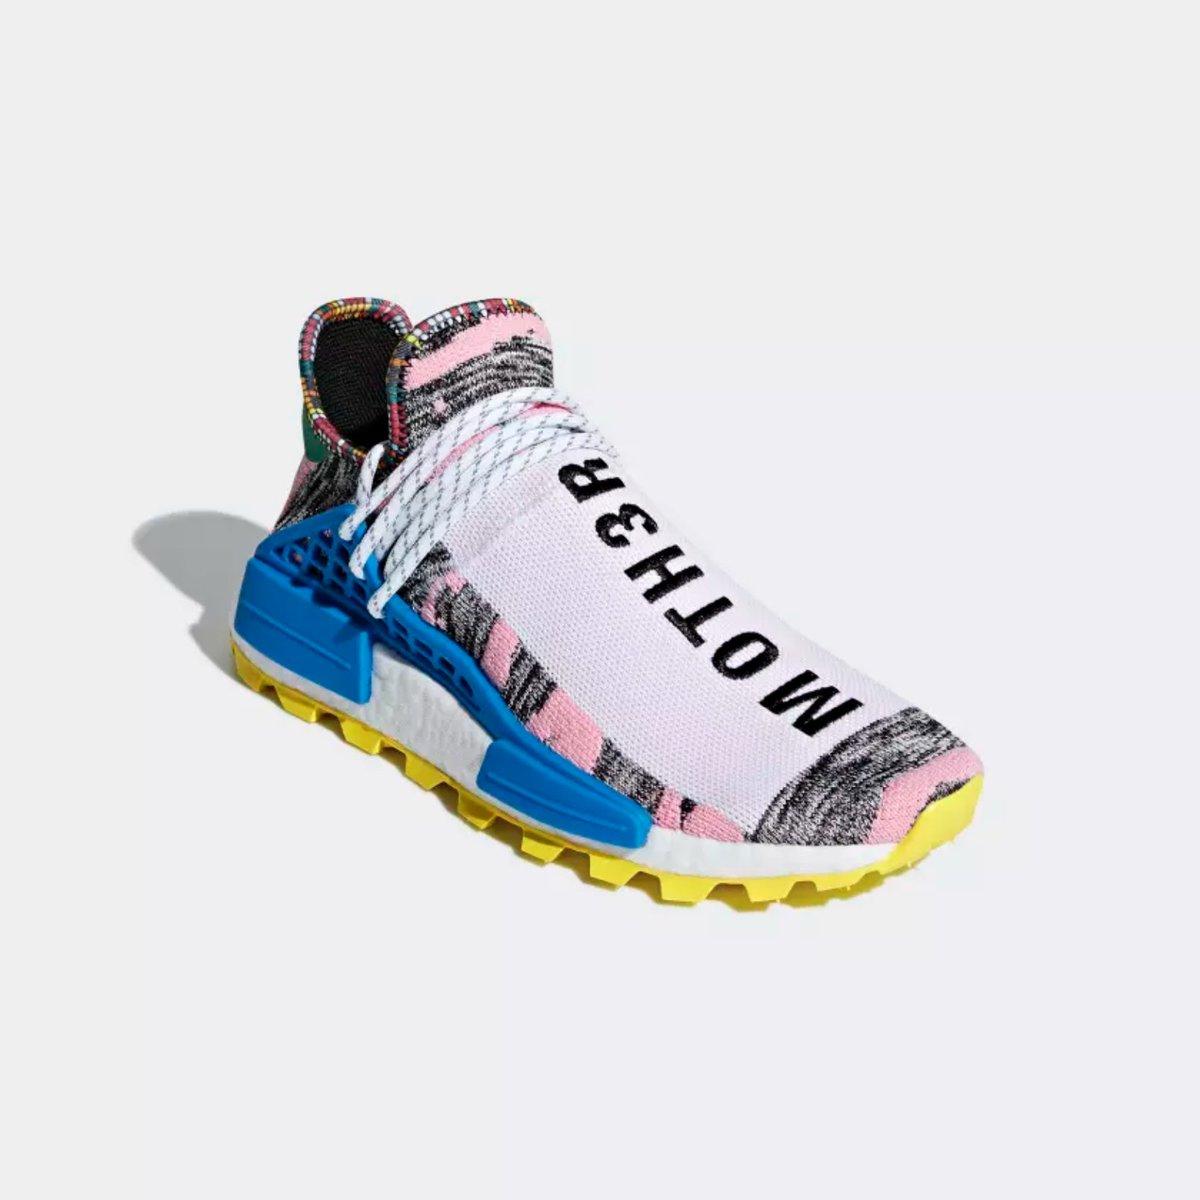 b4a8ad33d Sneaker Myth on Twitter